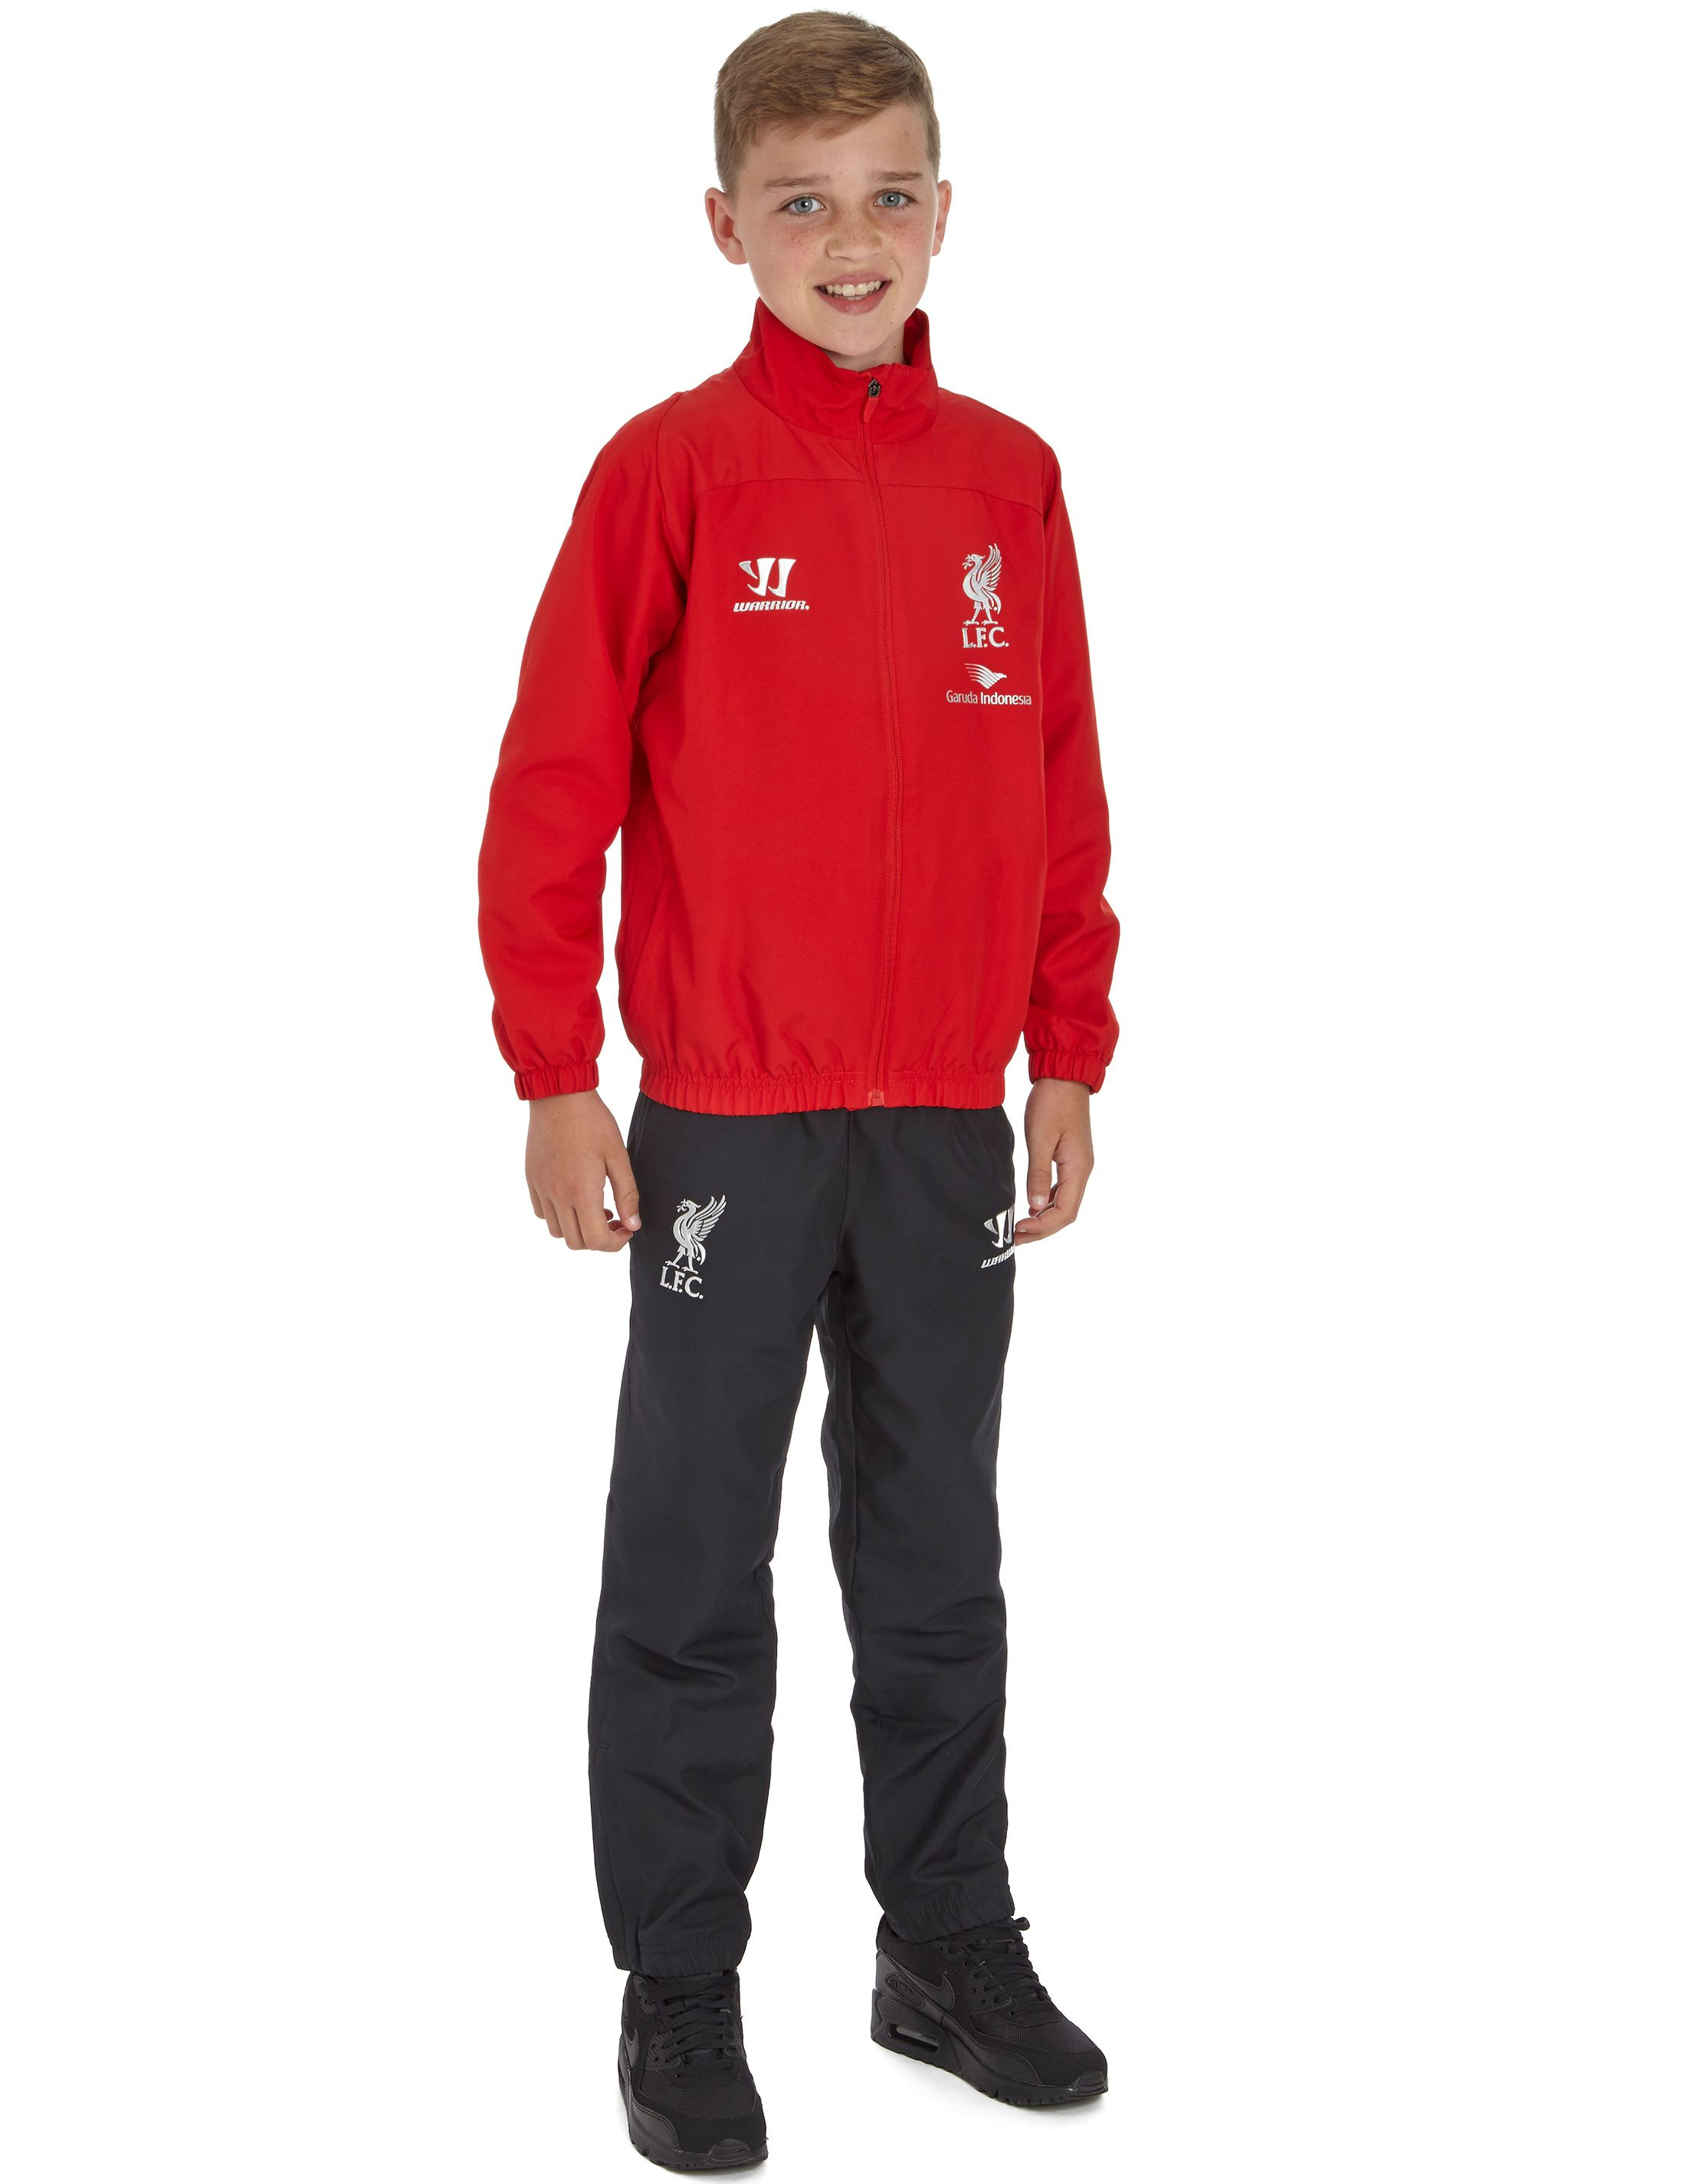 Warrior Sports Liverpool 2014 Junior Presentation Pants